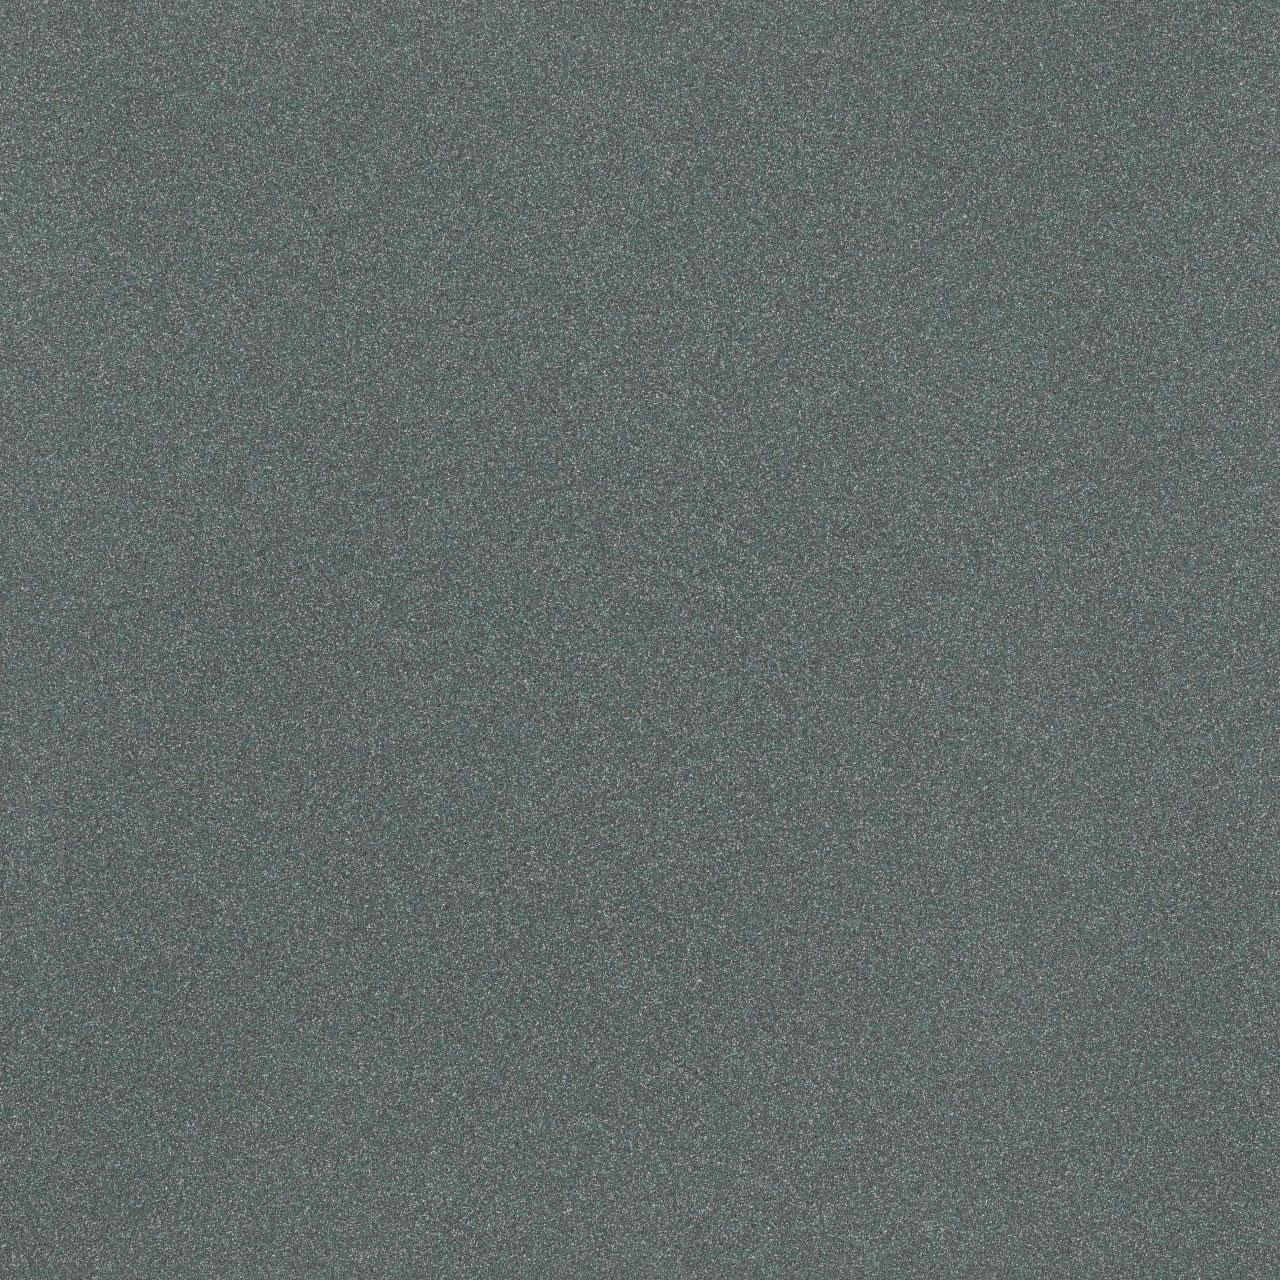 micron verde po 80×80